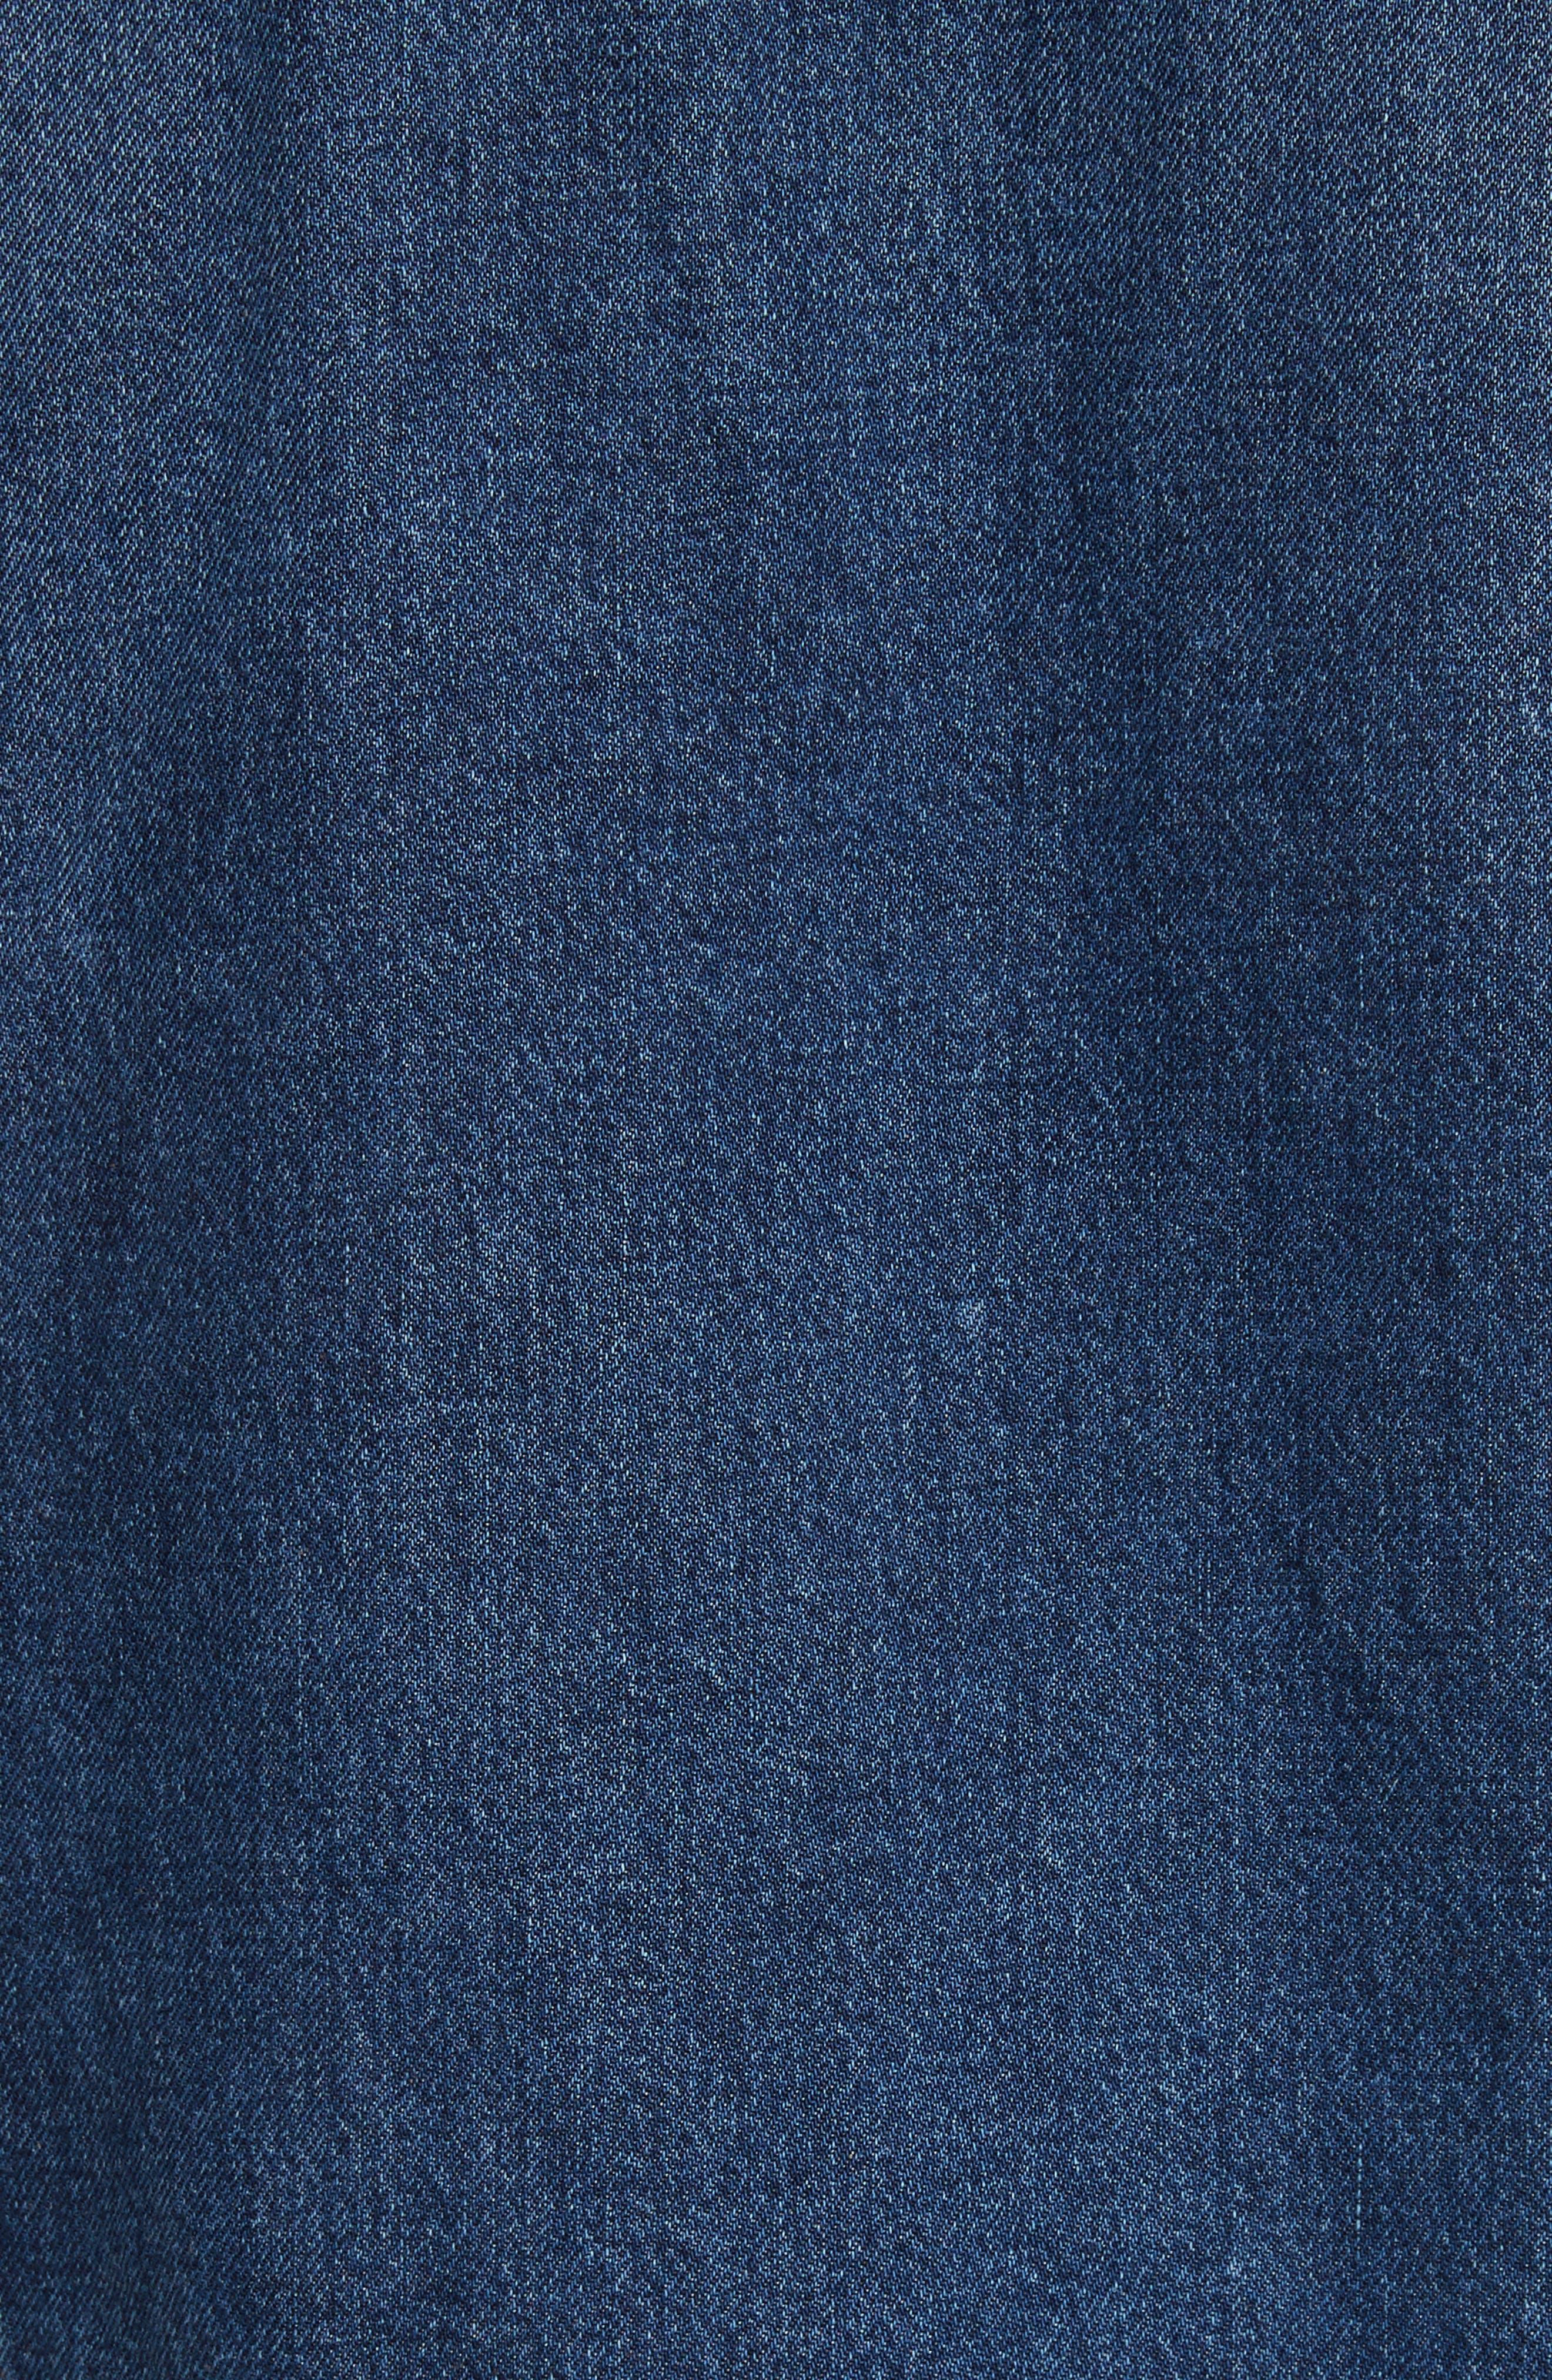 Denim Jacket,                             Alternate thumbnail 6, color,                             MID BLUE